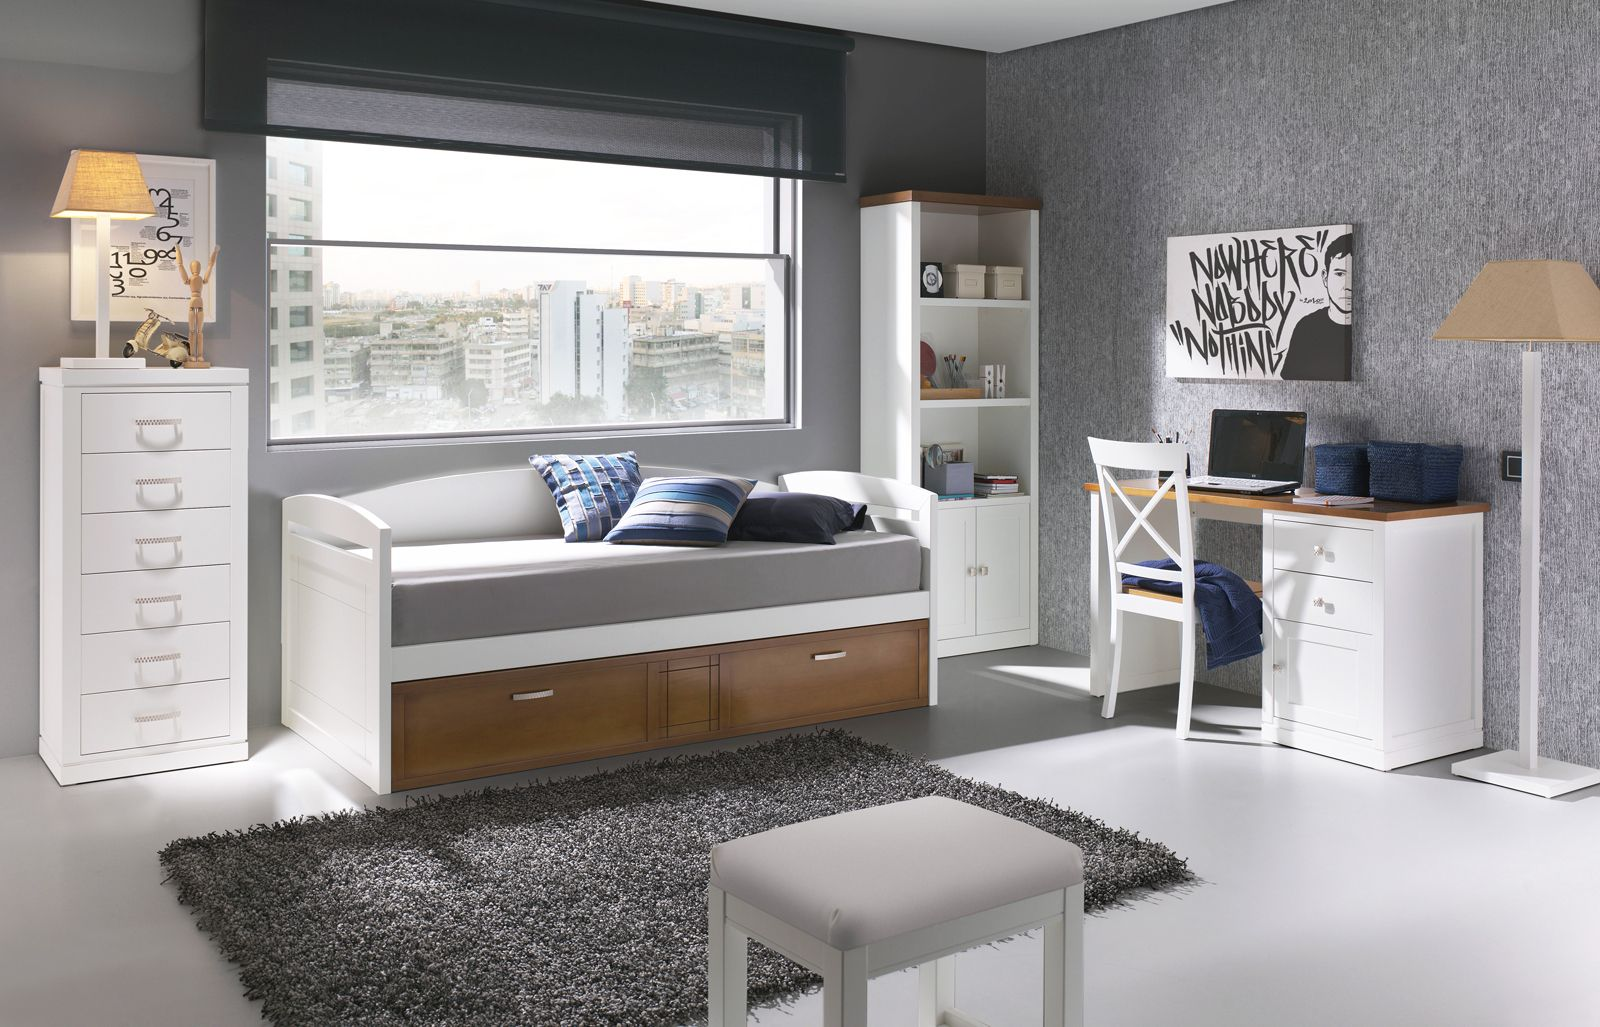 Dormitorios juveniles buscar con google cuarto pedro - Decoracion para dormitorio juvenil ...